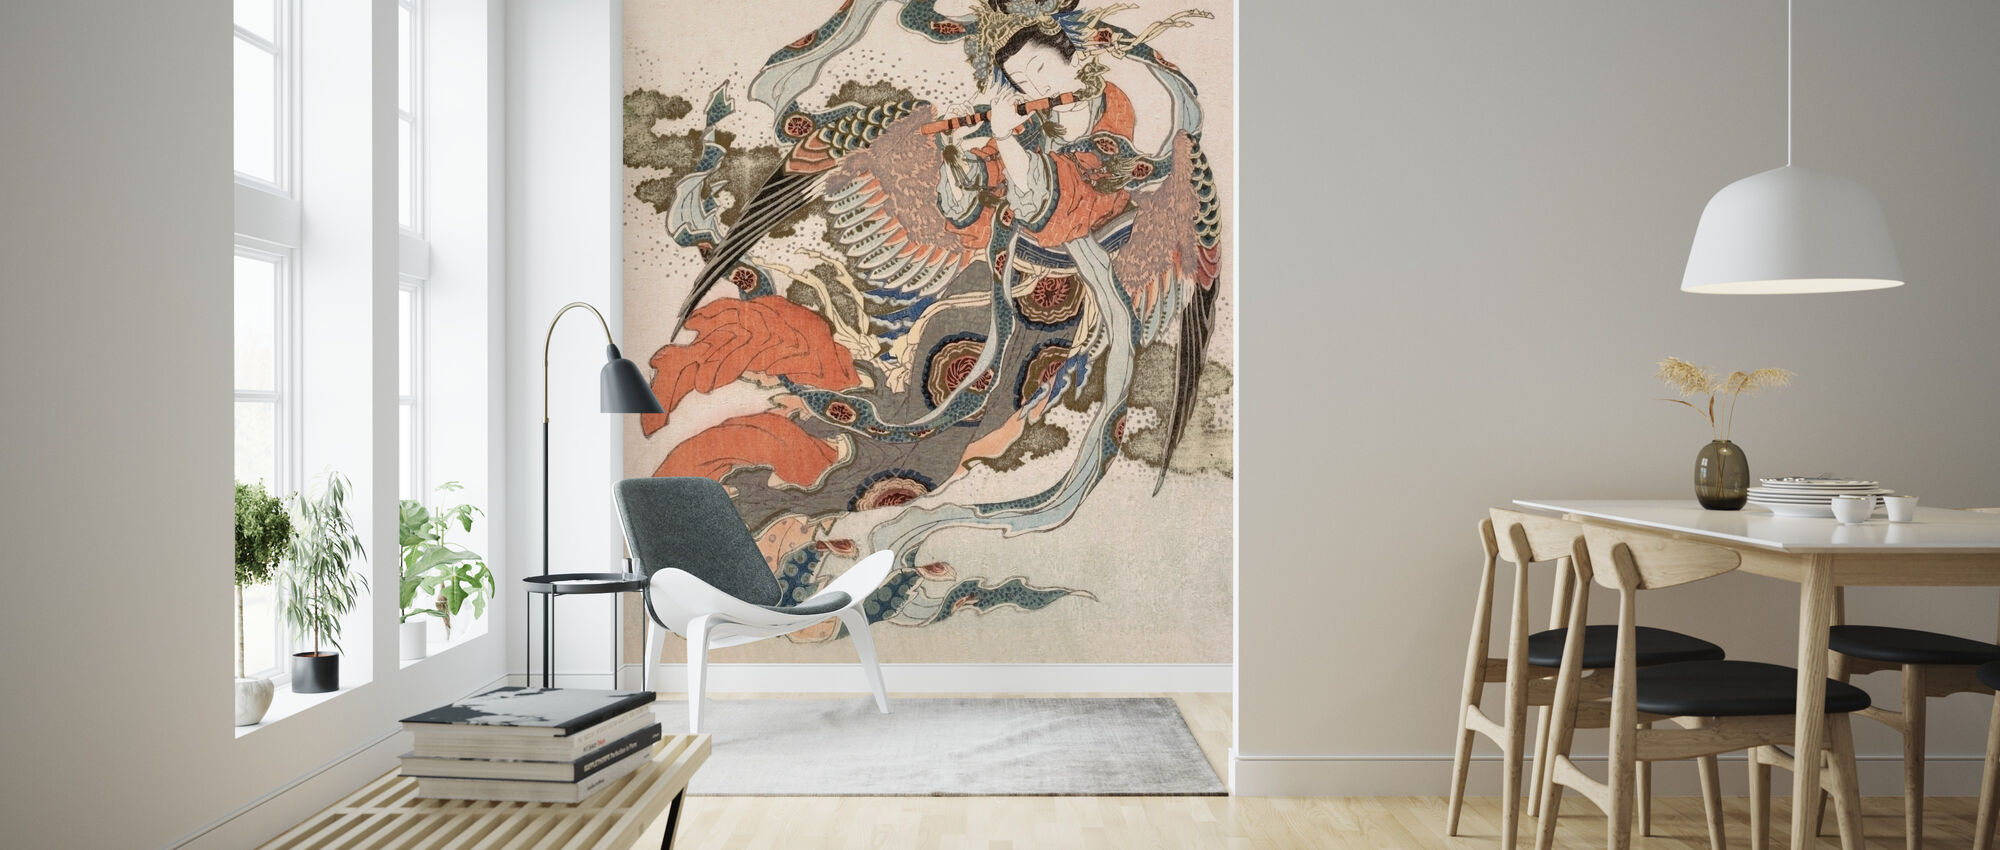 Asian Angel - Wallpaper - Living Room